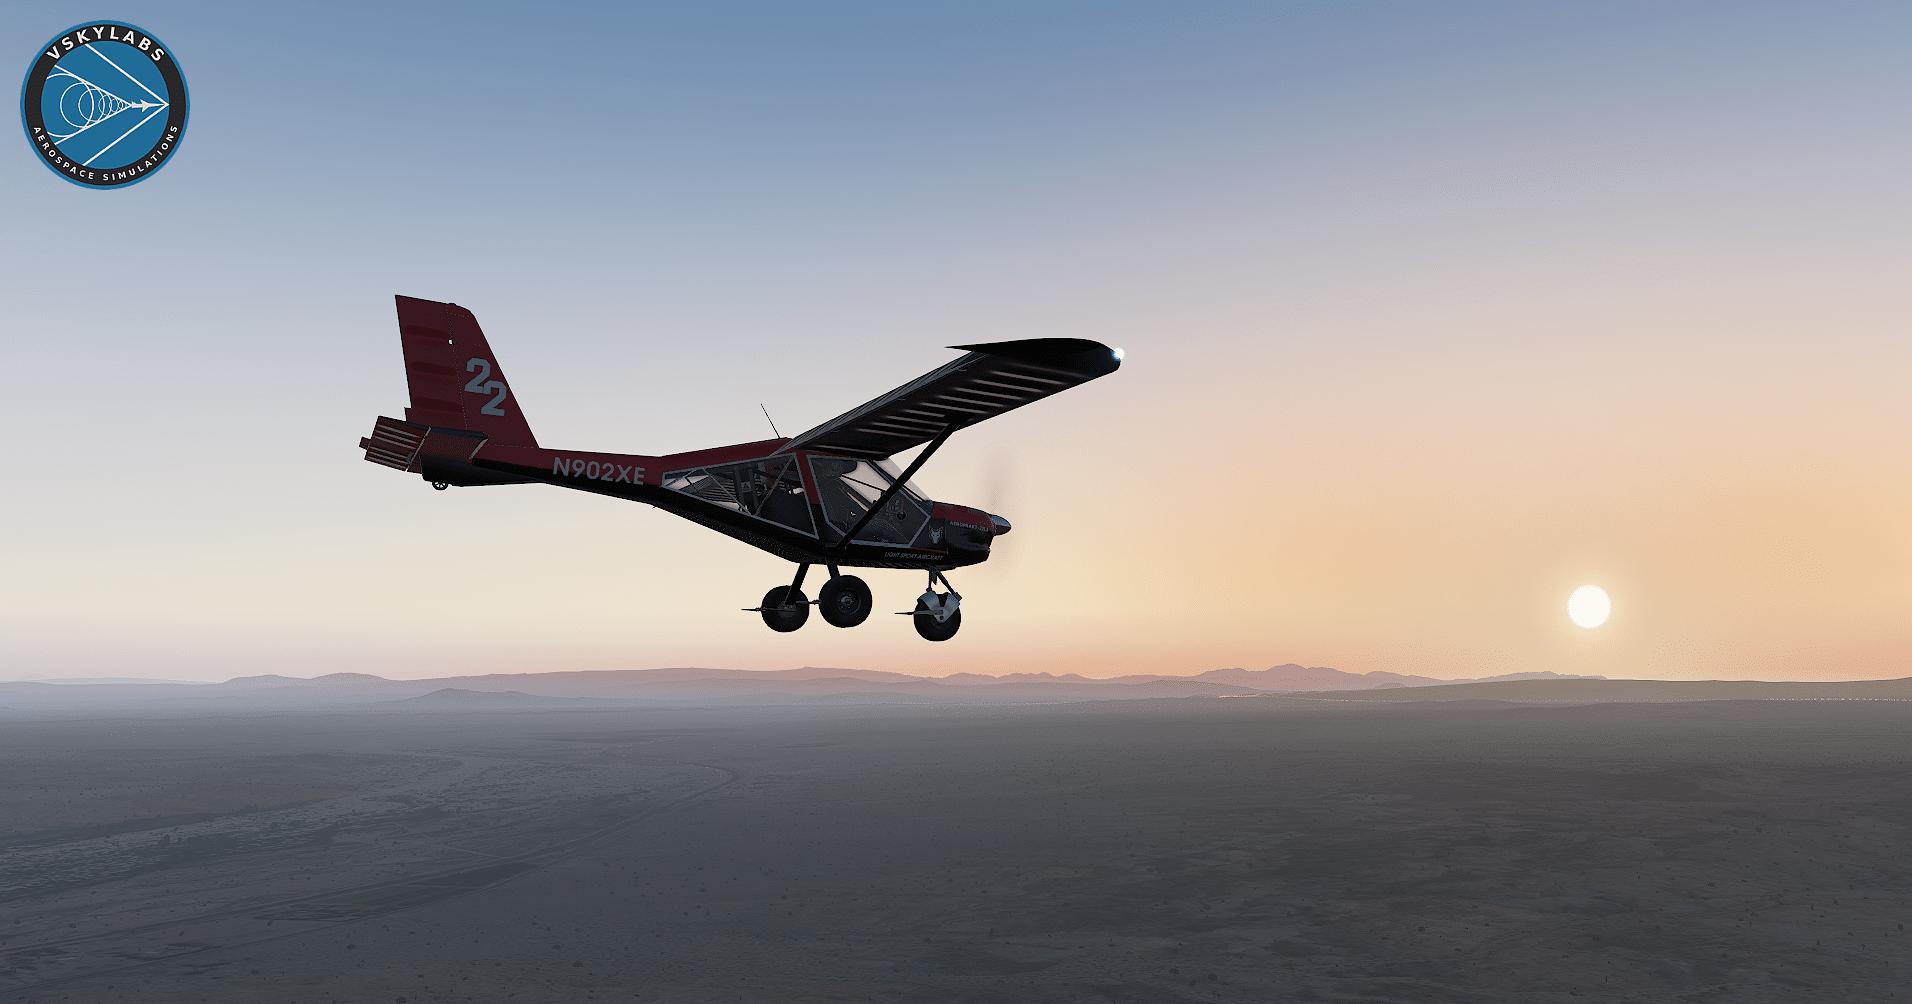 vskylabs-aeroprakt-a22-ls-v1.0-027